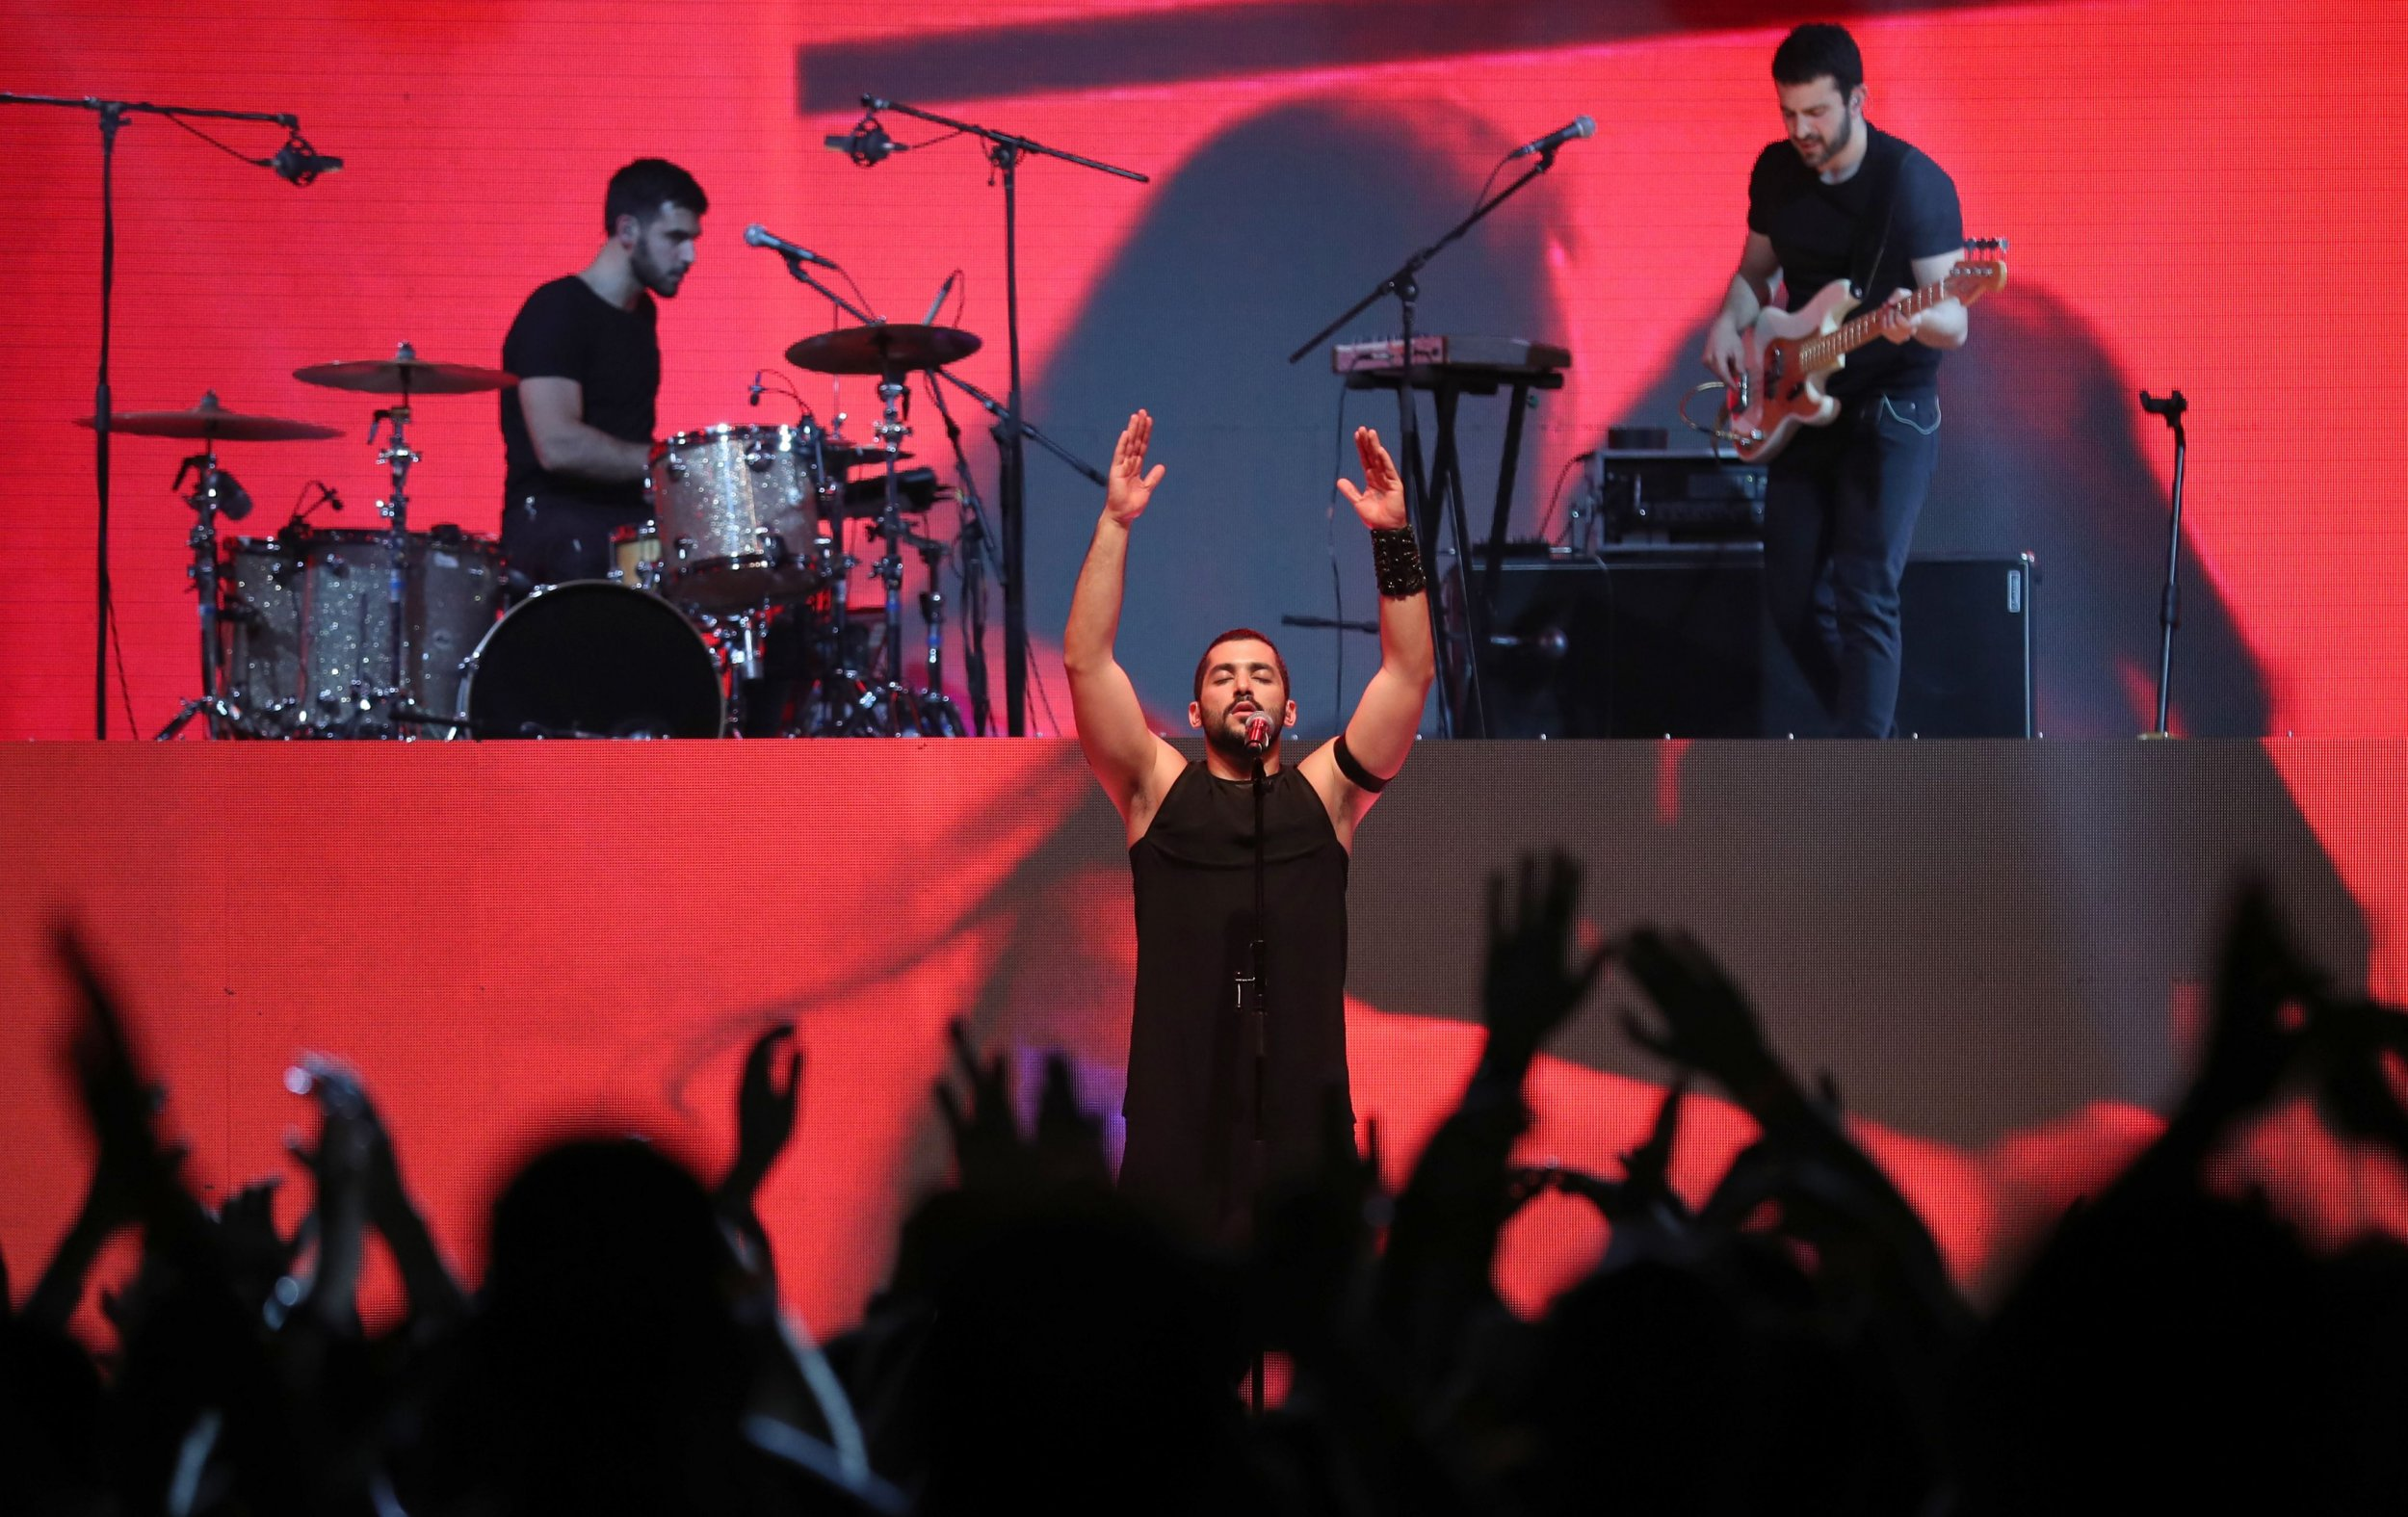 Hamed Sinno of Mashrou' Leila, band banned in Jordan